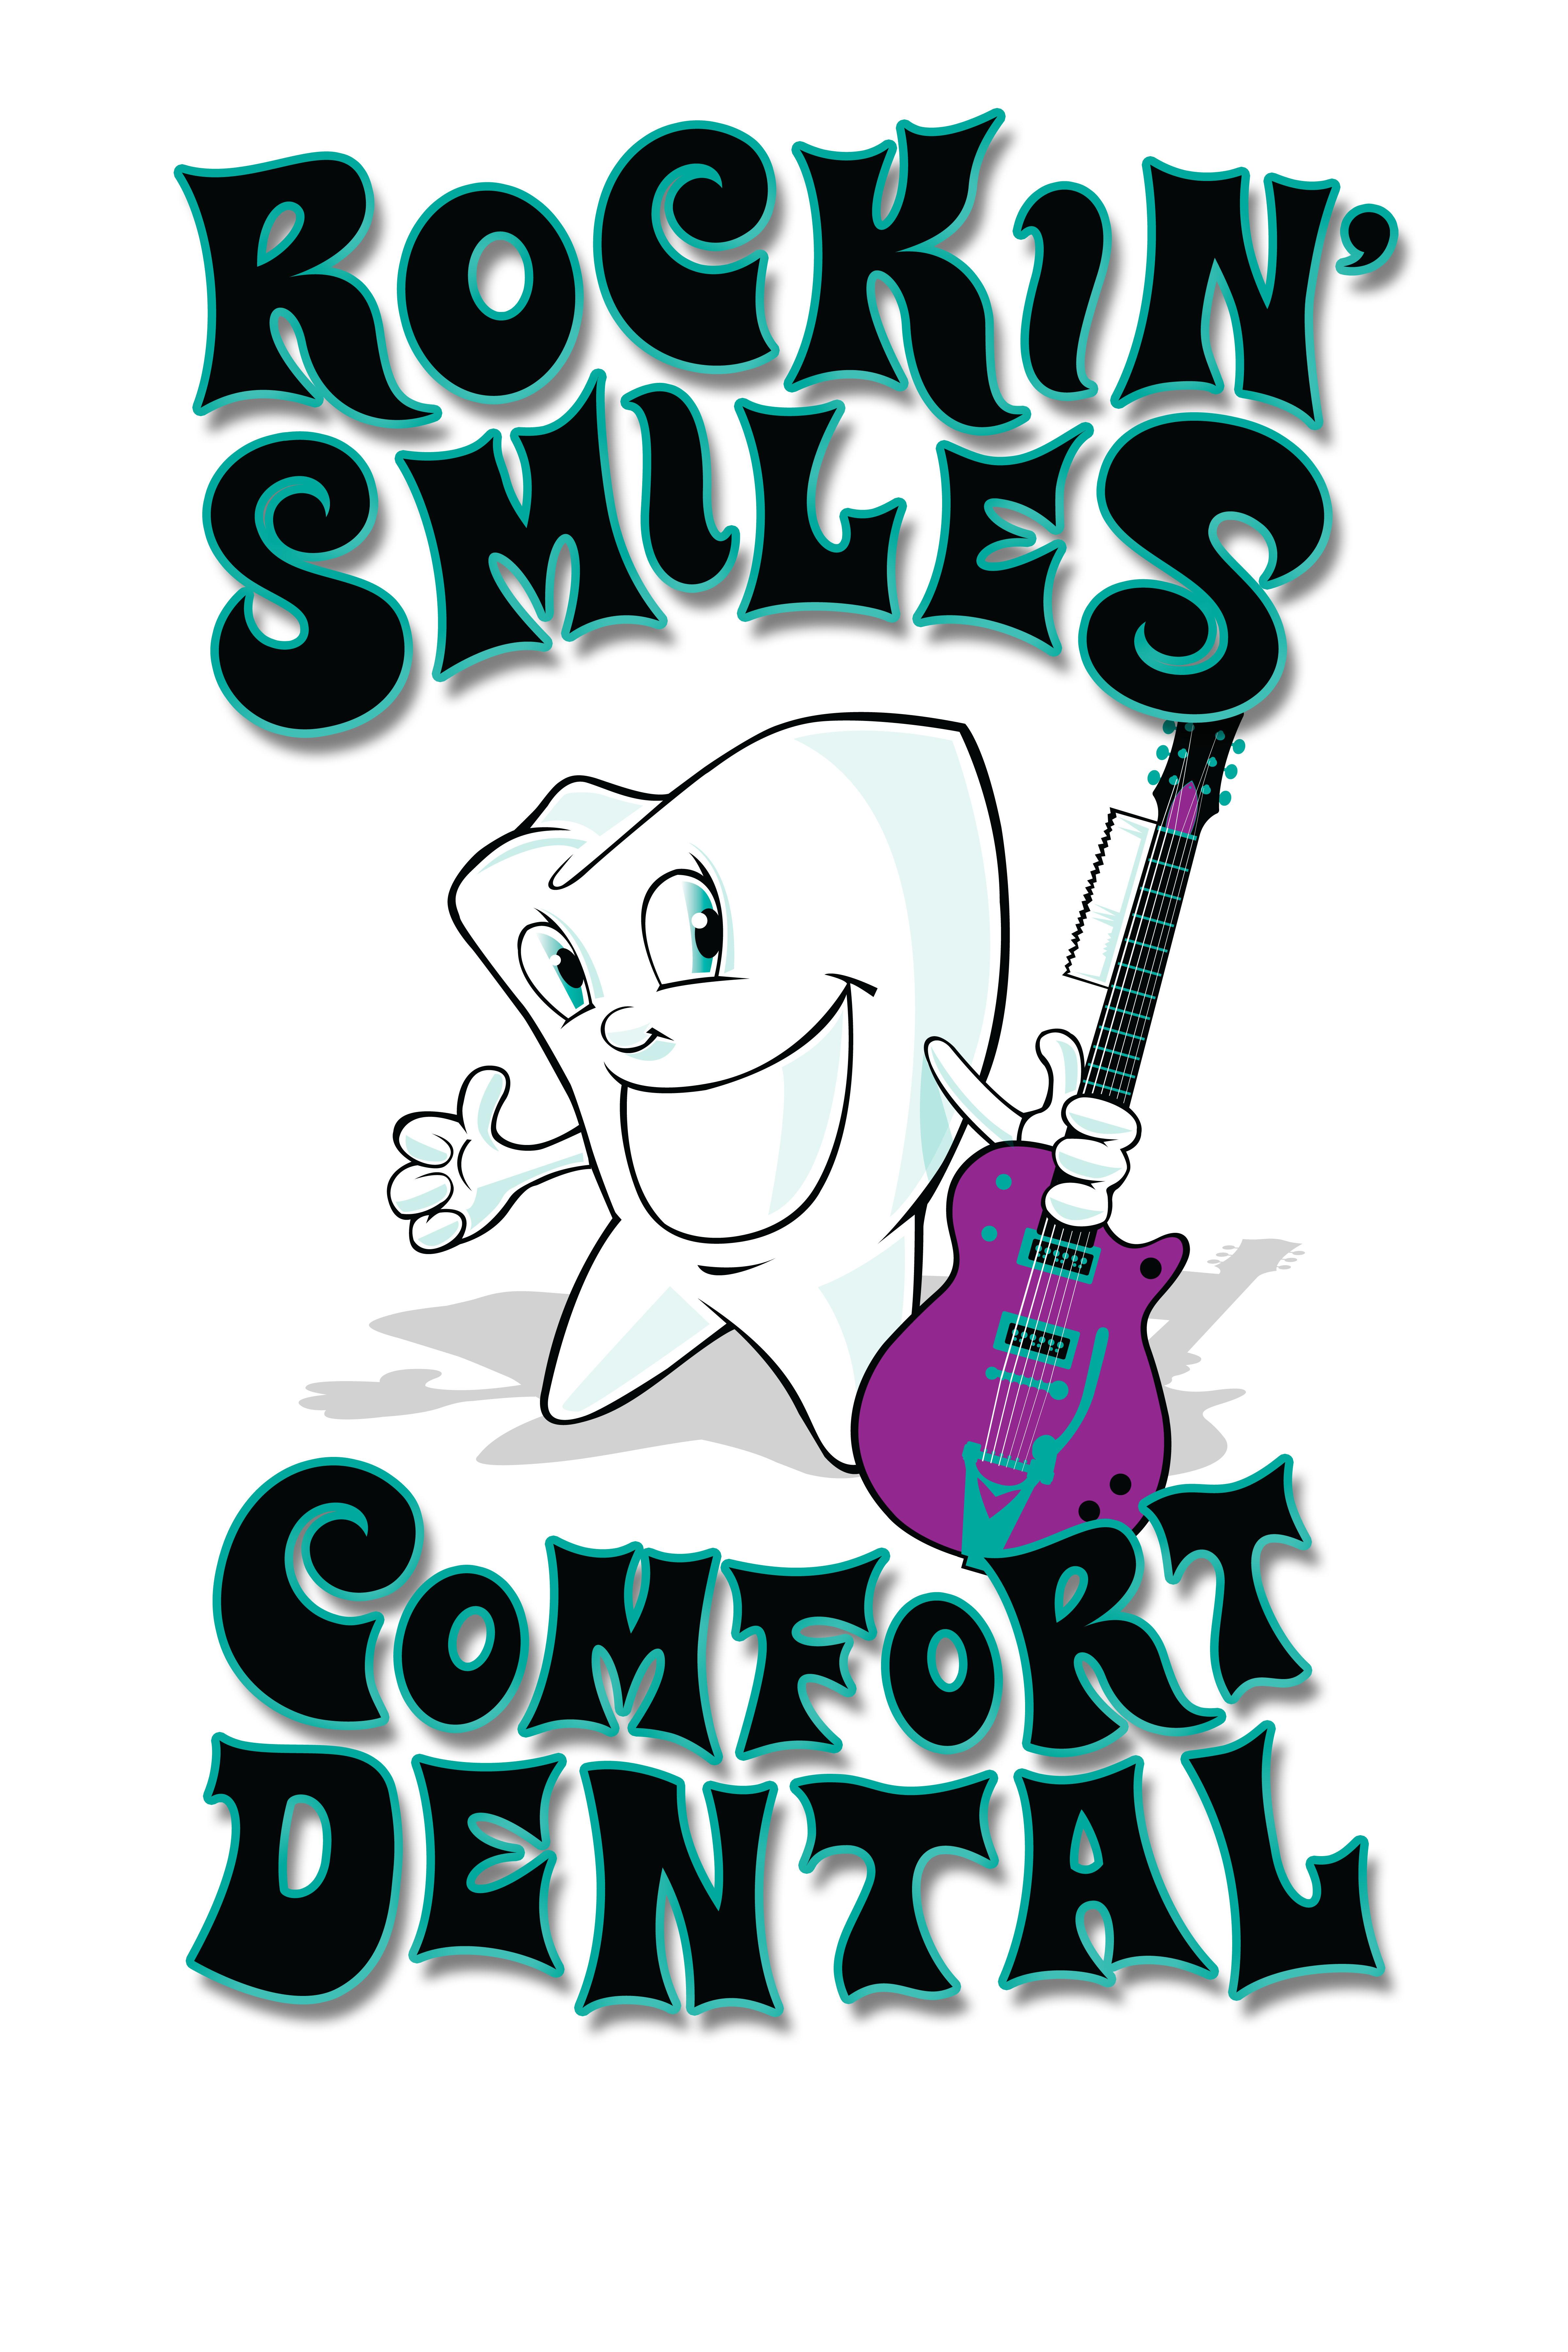 action city kansas local dental offered comfort comfortdental area comforter news care com to residents kshb free